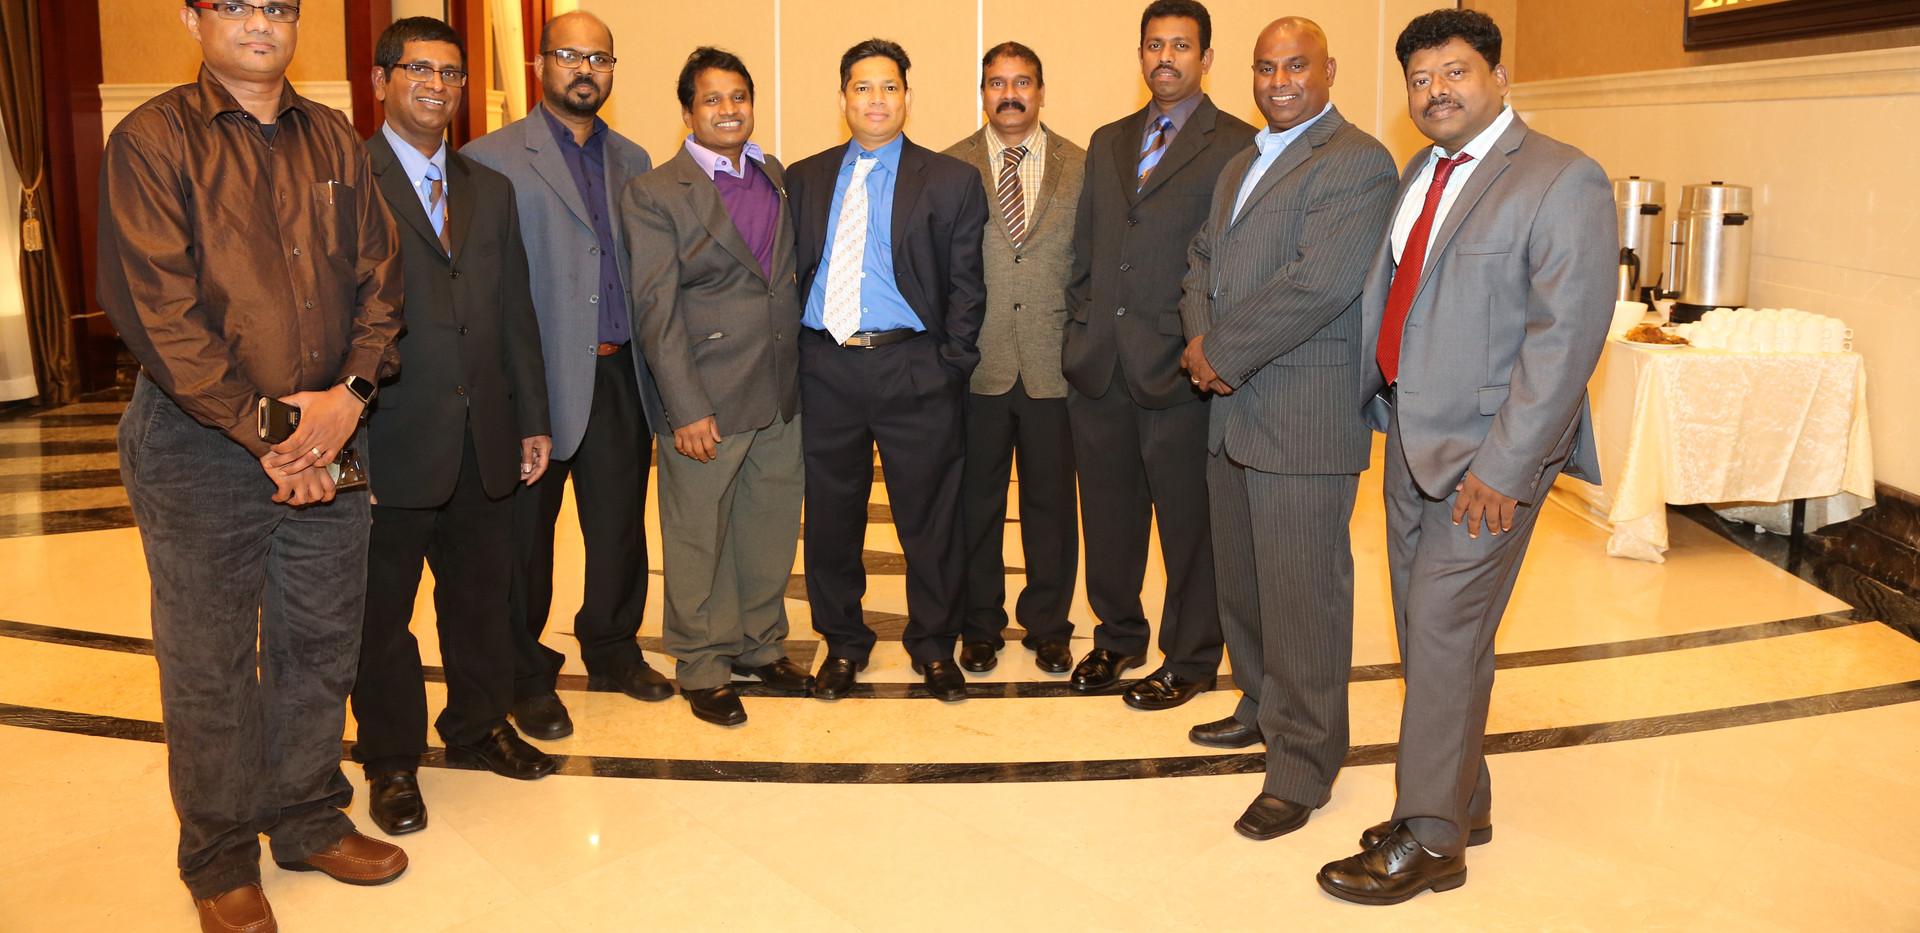 jccoba dinner photos Sriranjan 2015-010.JPG.jpg